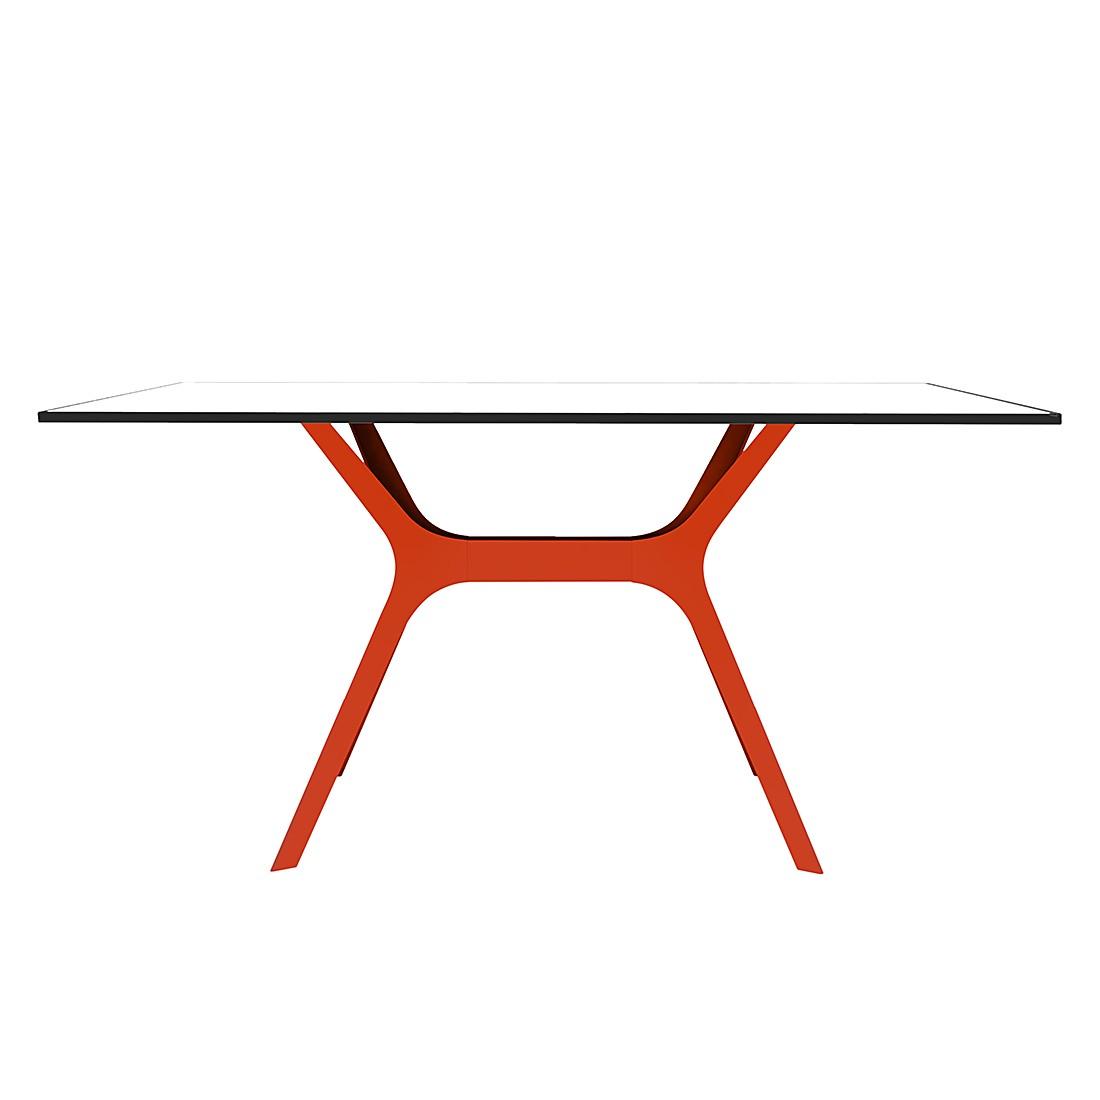 Eettafel Vela II - Wit/rood - 120x80cm, loftscape